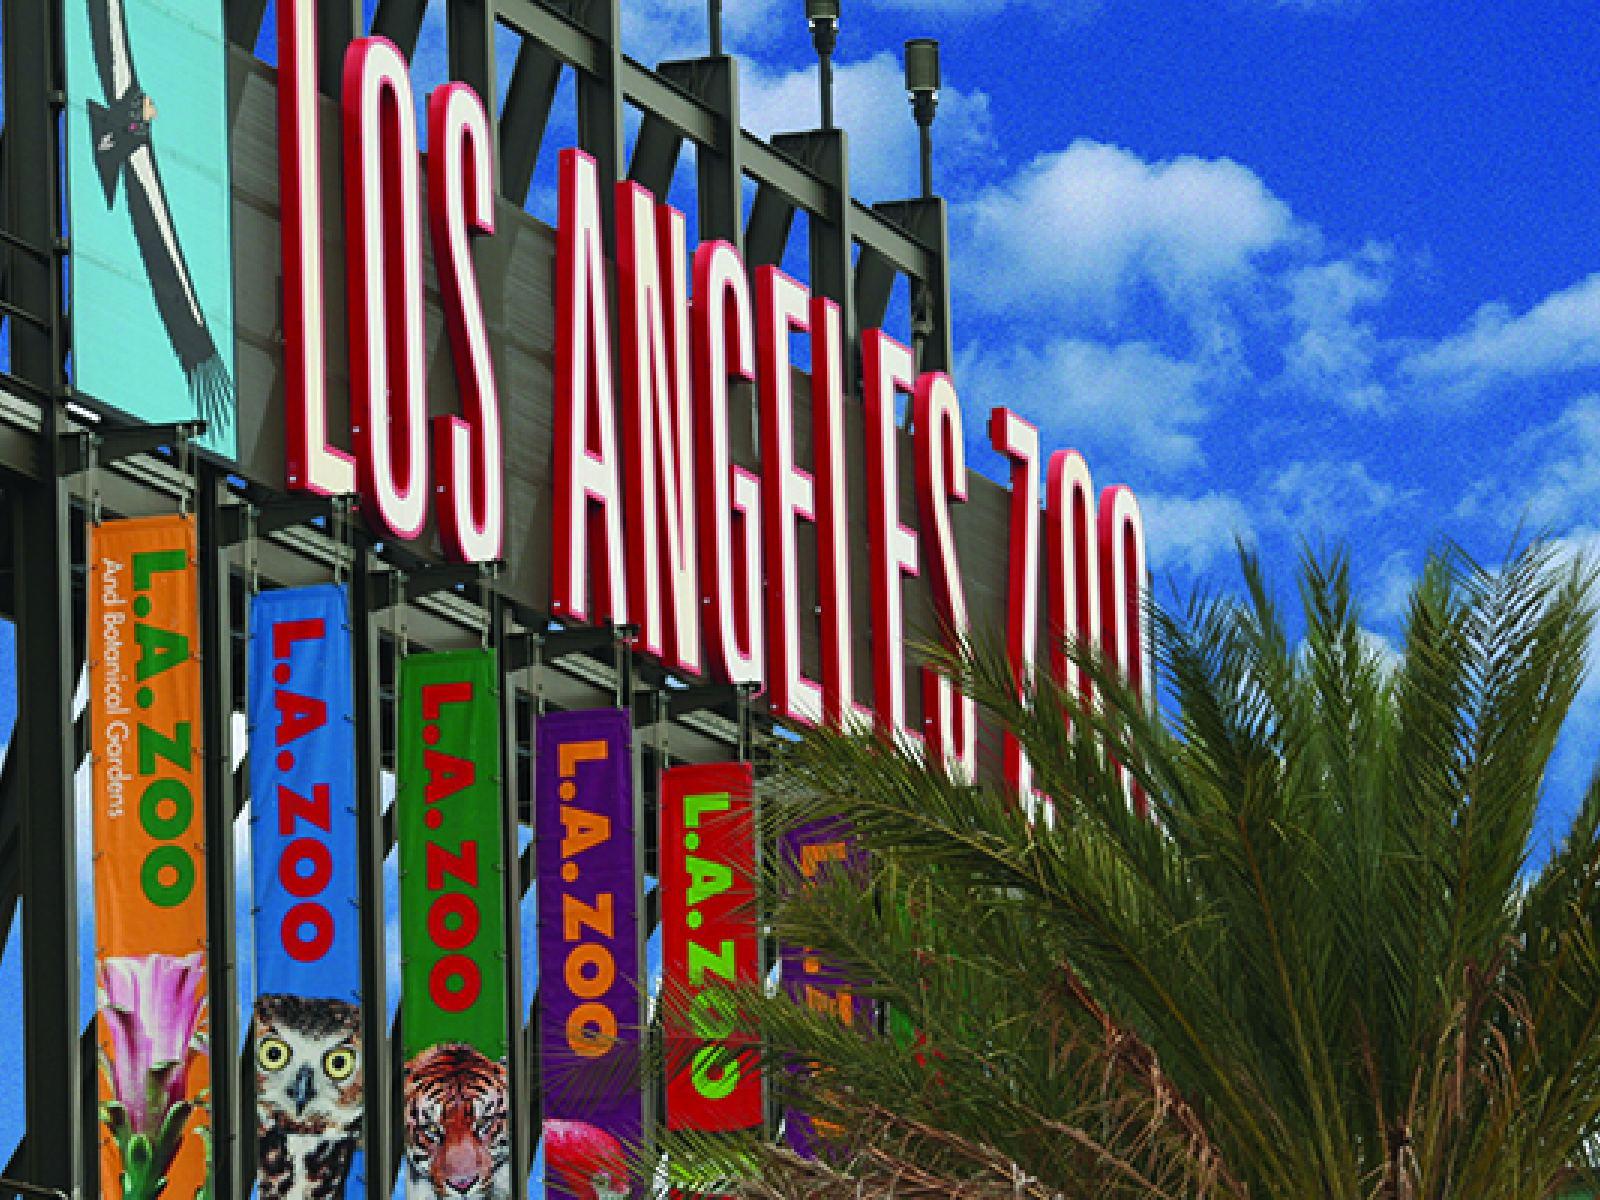 Main image for article titled El Zoológico de Los Ángeles